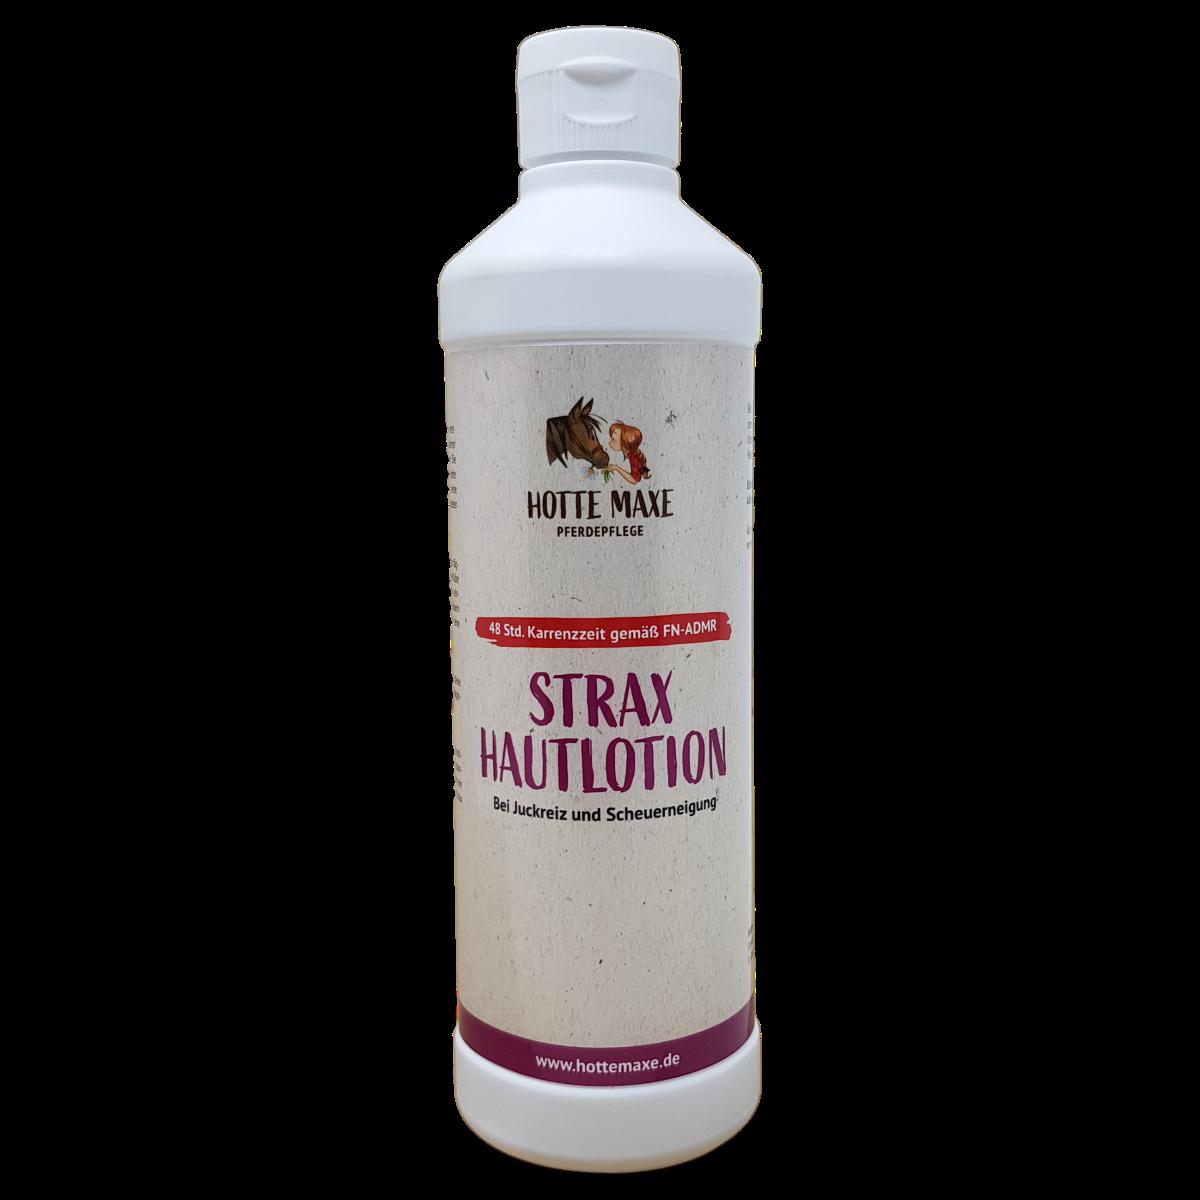 Hotte Maxe Strax-Hautlotion